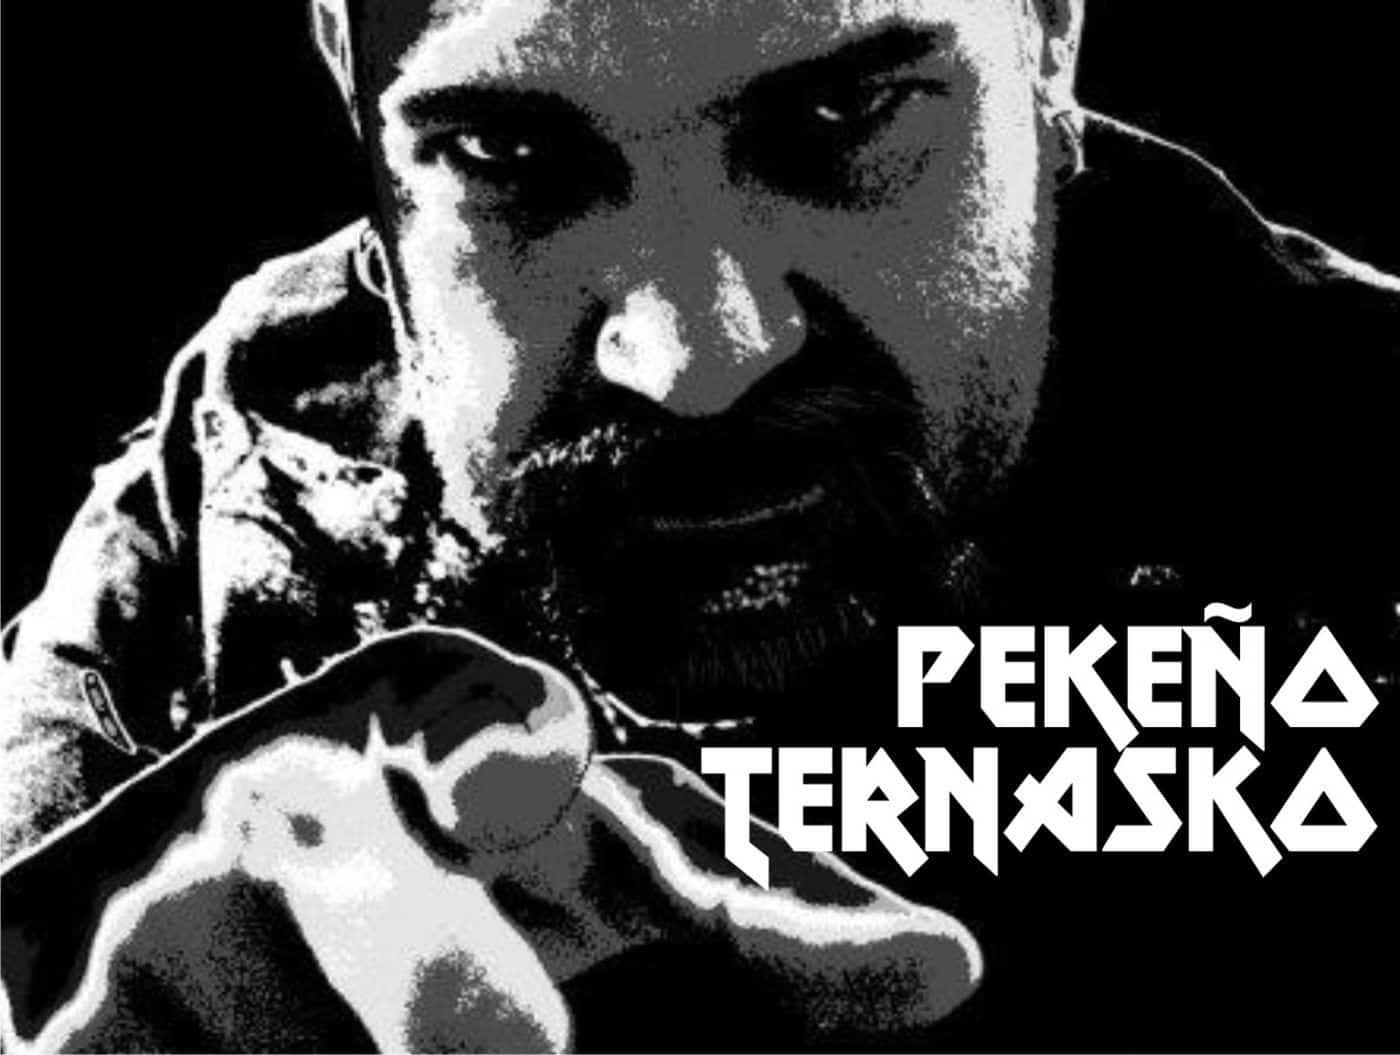 Pekeño Ternasko 033: Juguetes peligrosos